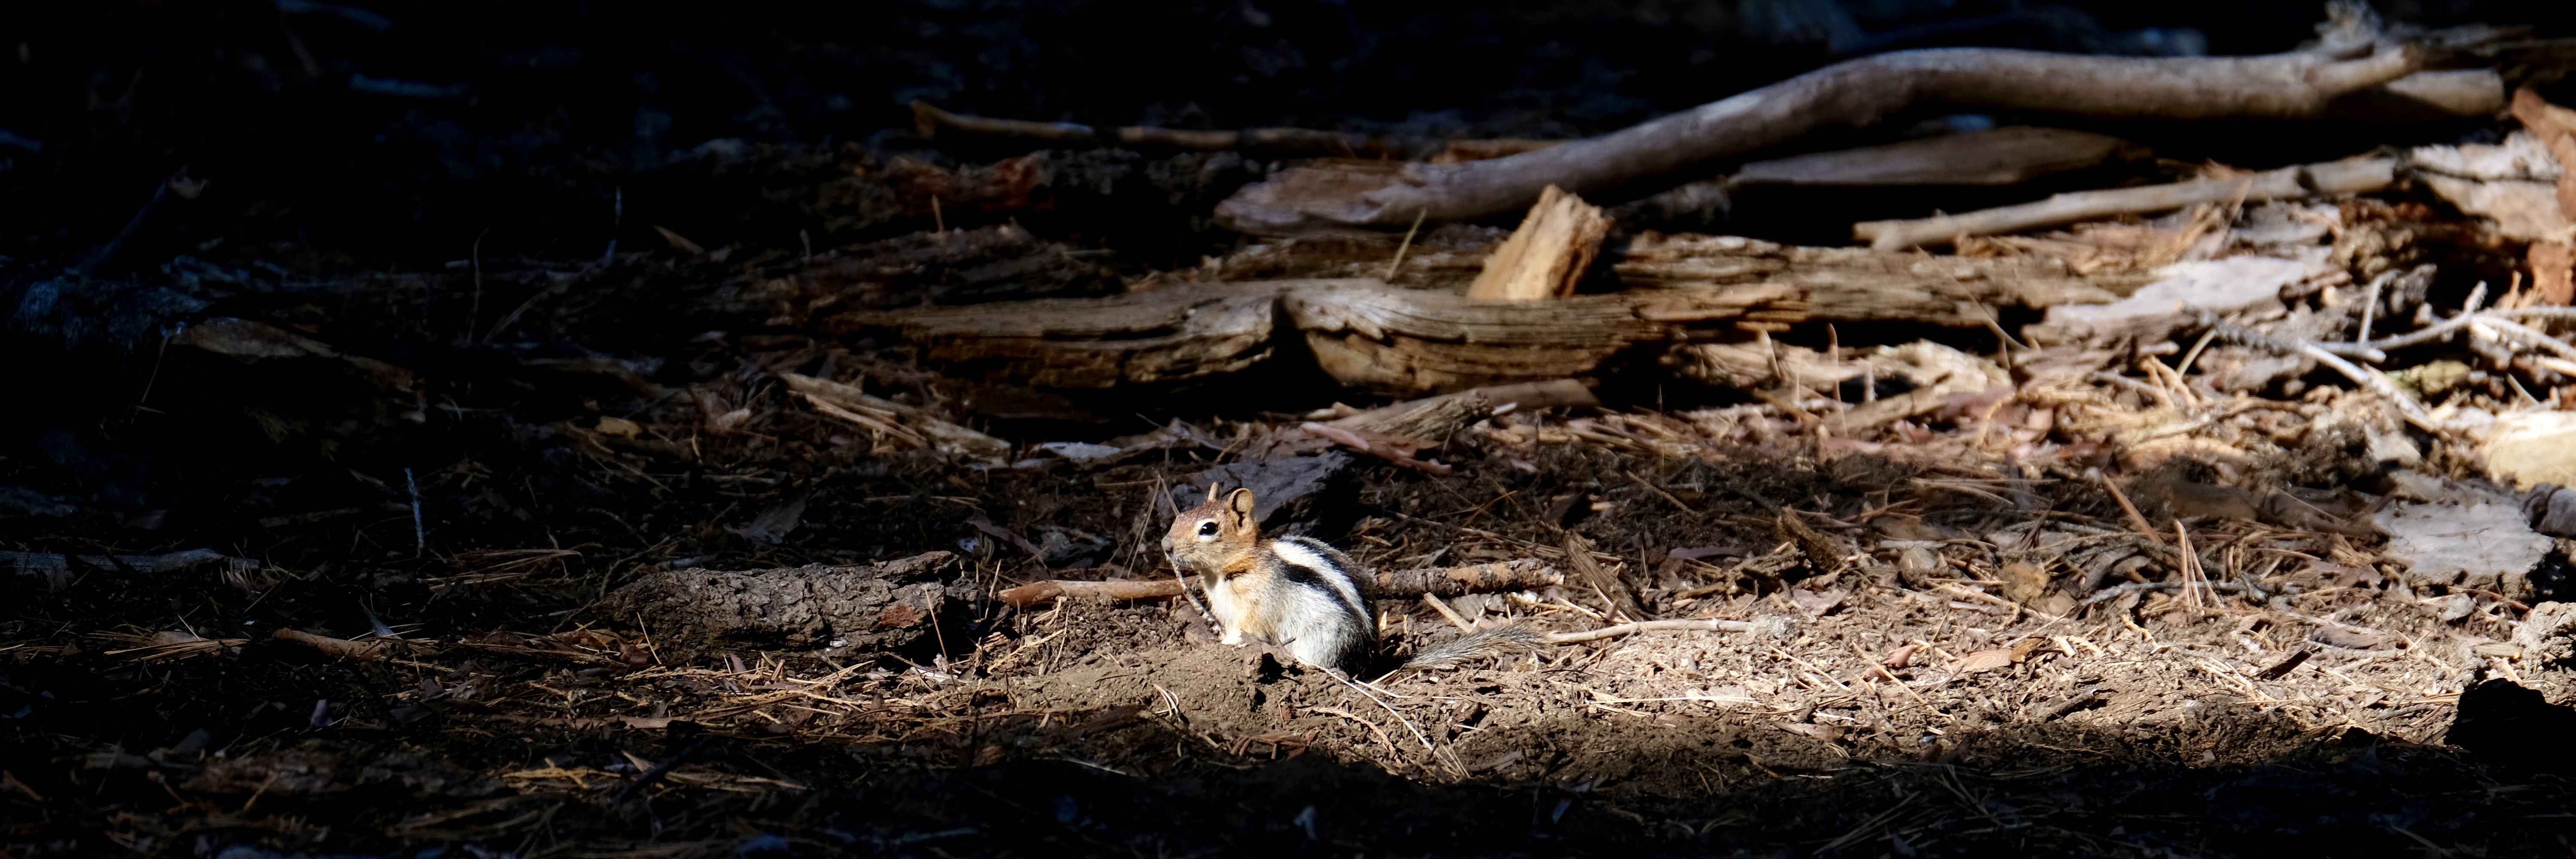 Sequoia Park - Alvin le Chipmunk